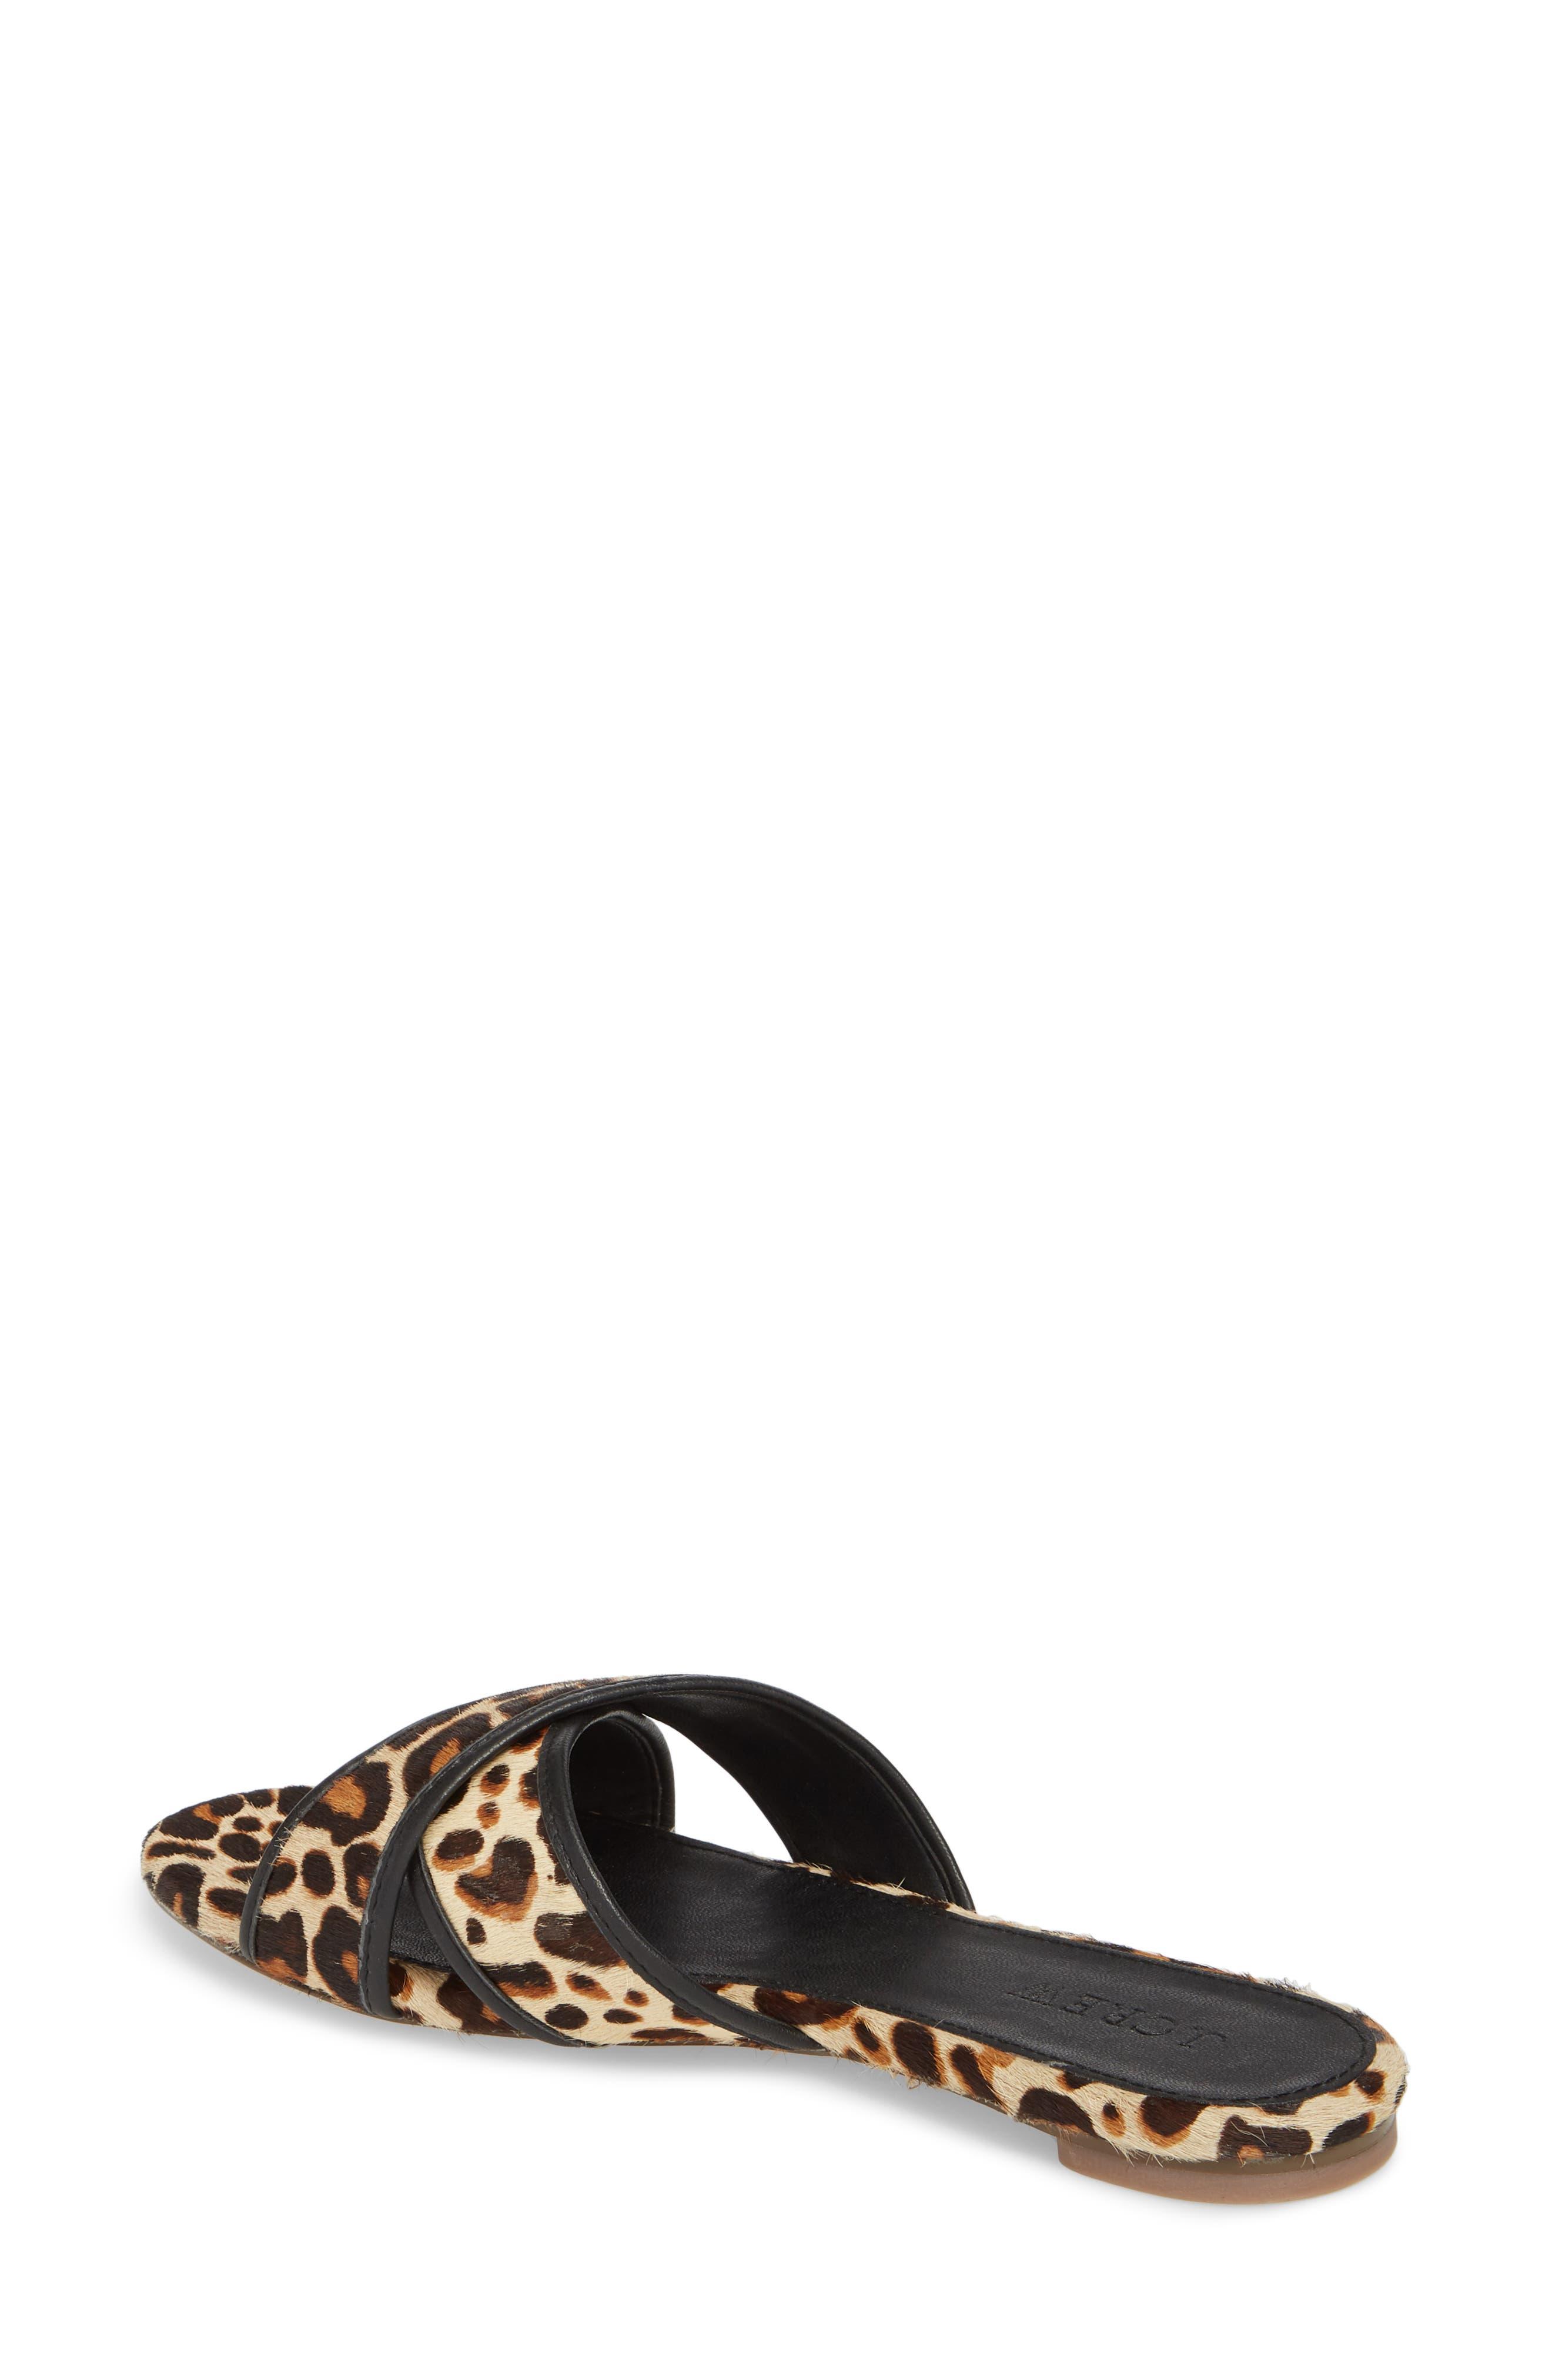 Cora Genuine Calf Hair Slide Sandal,                             Alternate thumbnail 3, color,                             Chocolate Sepia